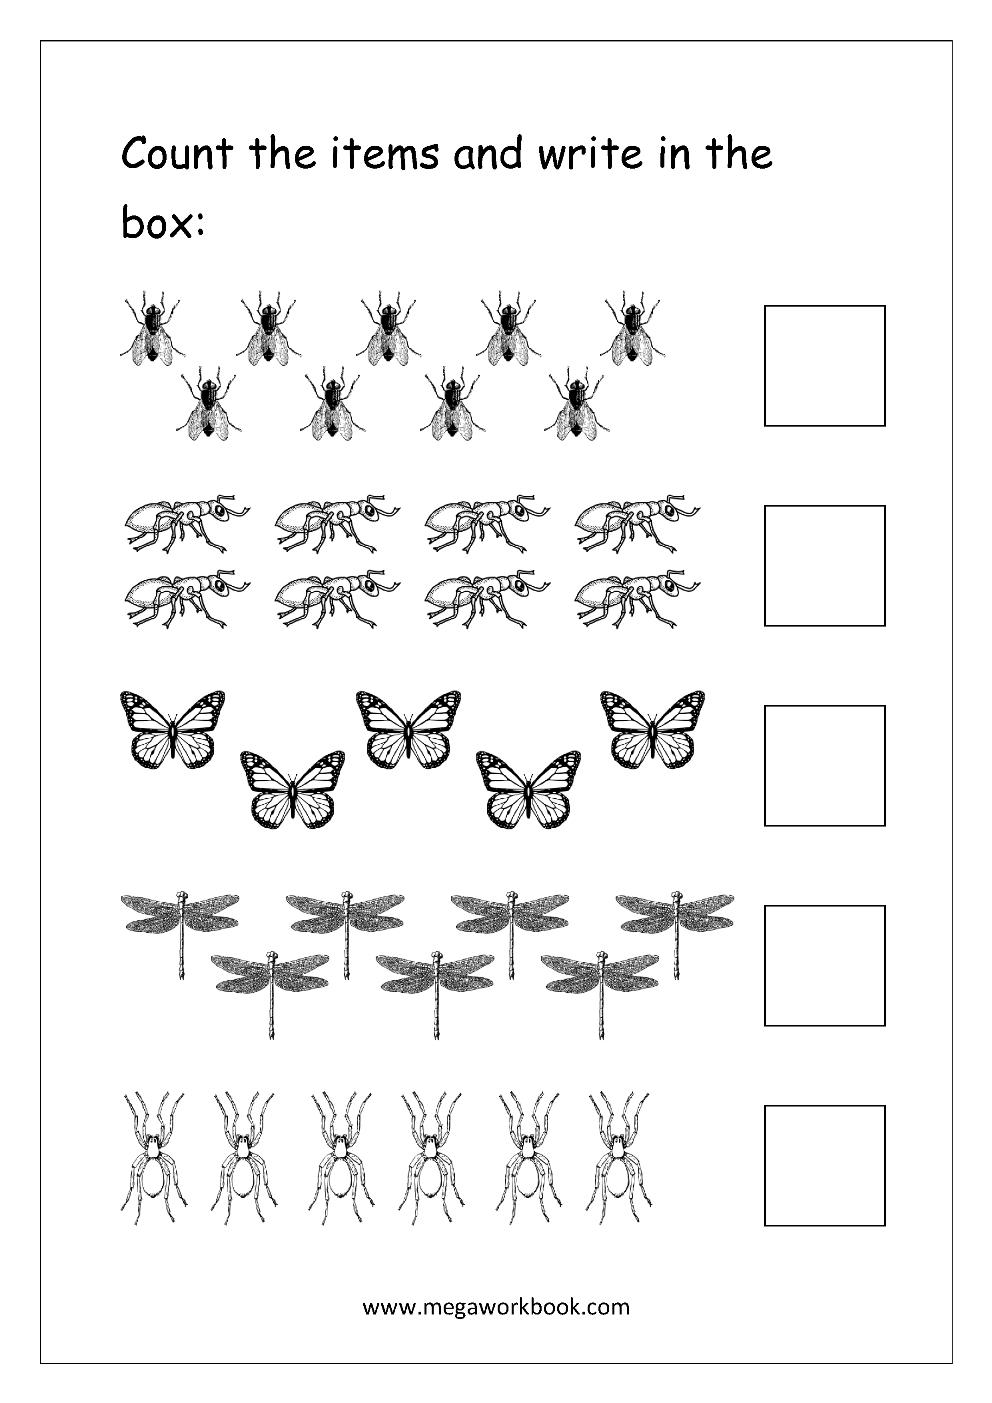 Free Printable Number Counting Worksheets - Count And Match - Count - Free Printable Counting Worksheets 1 10